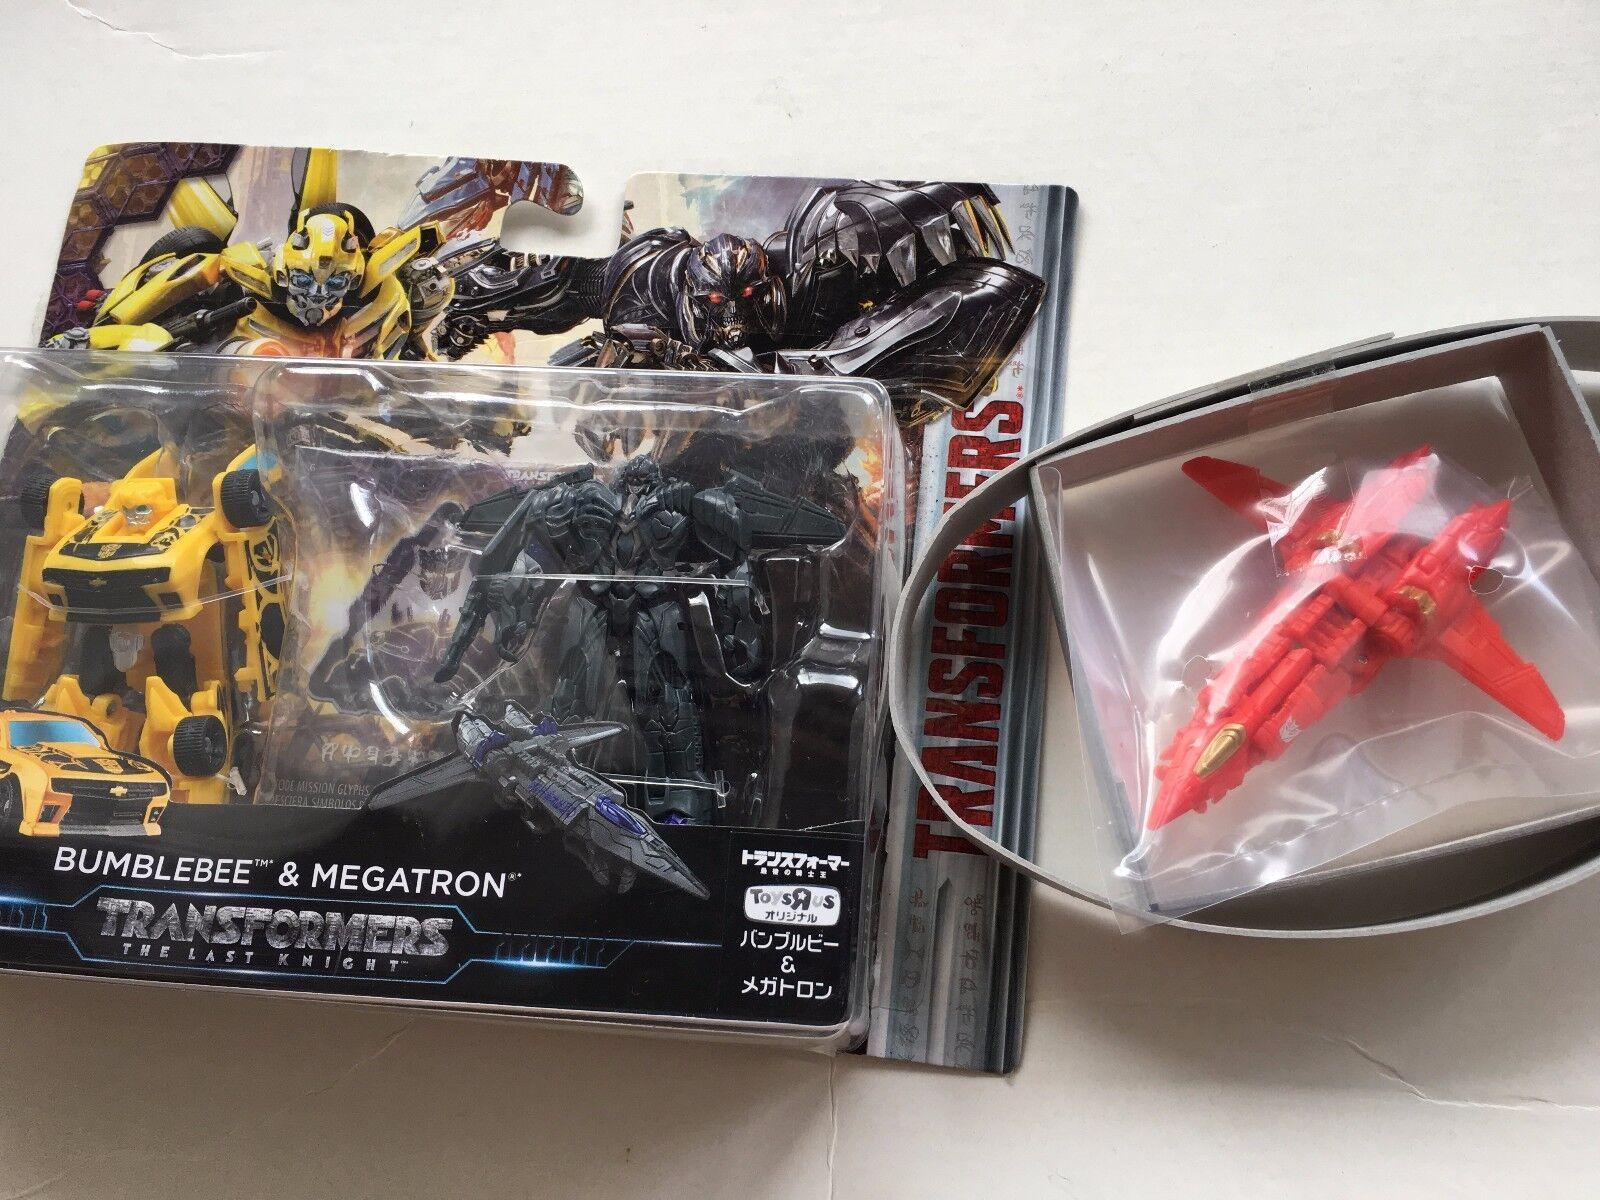 Le Japon Rare transformers Burning Megatron Limited Edition & Bumblebee & Megatron